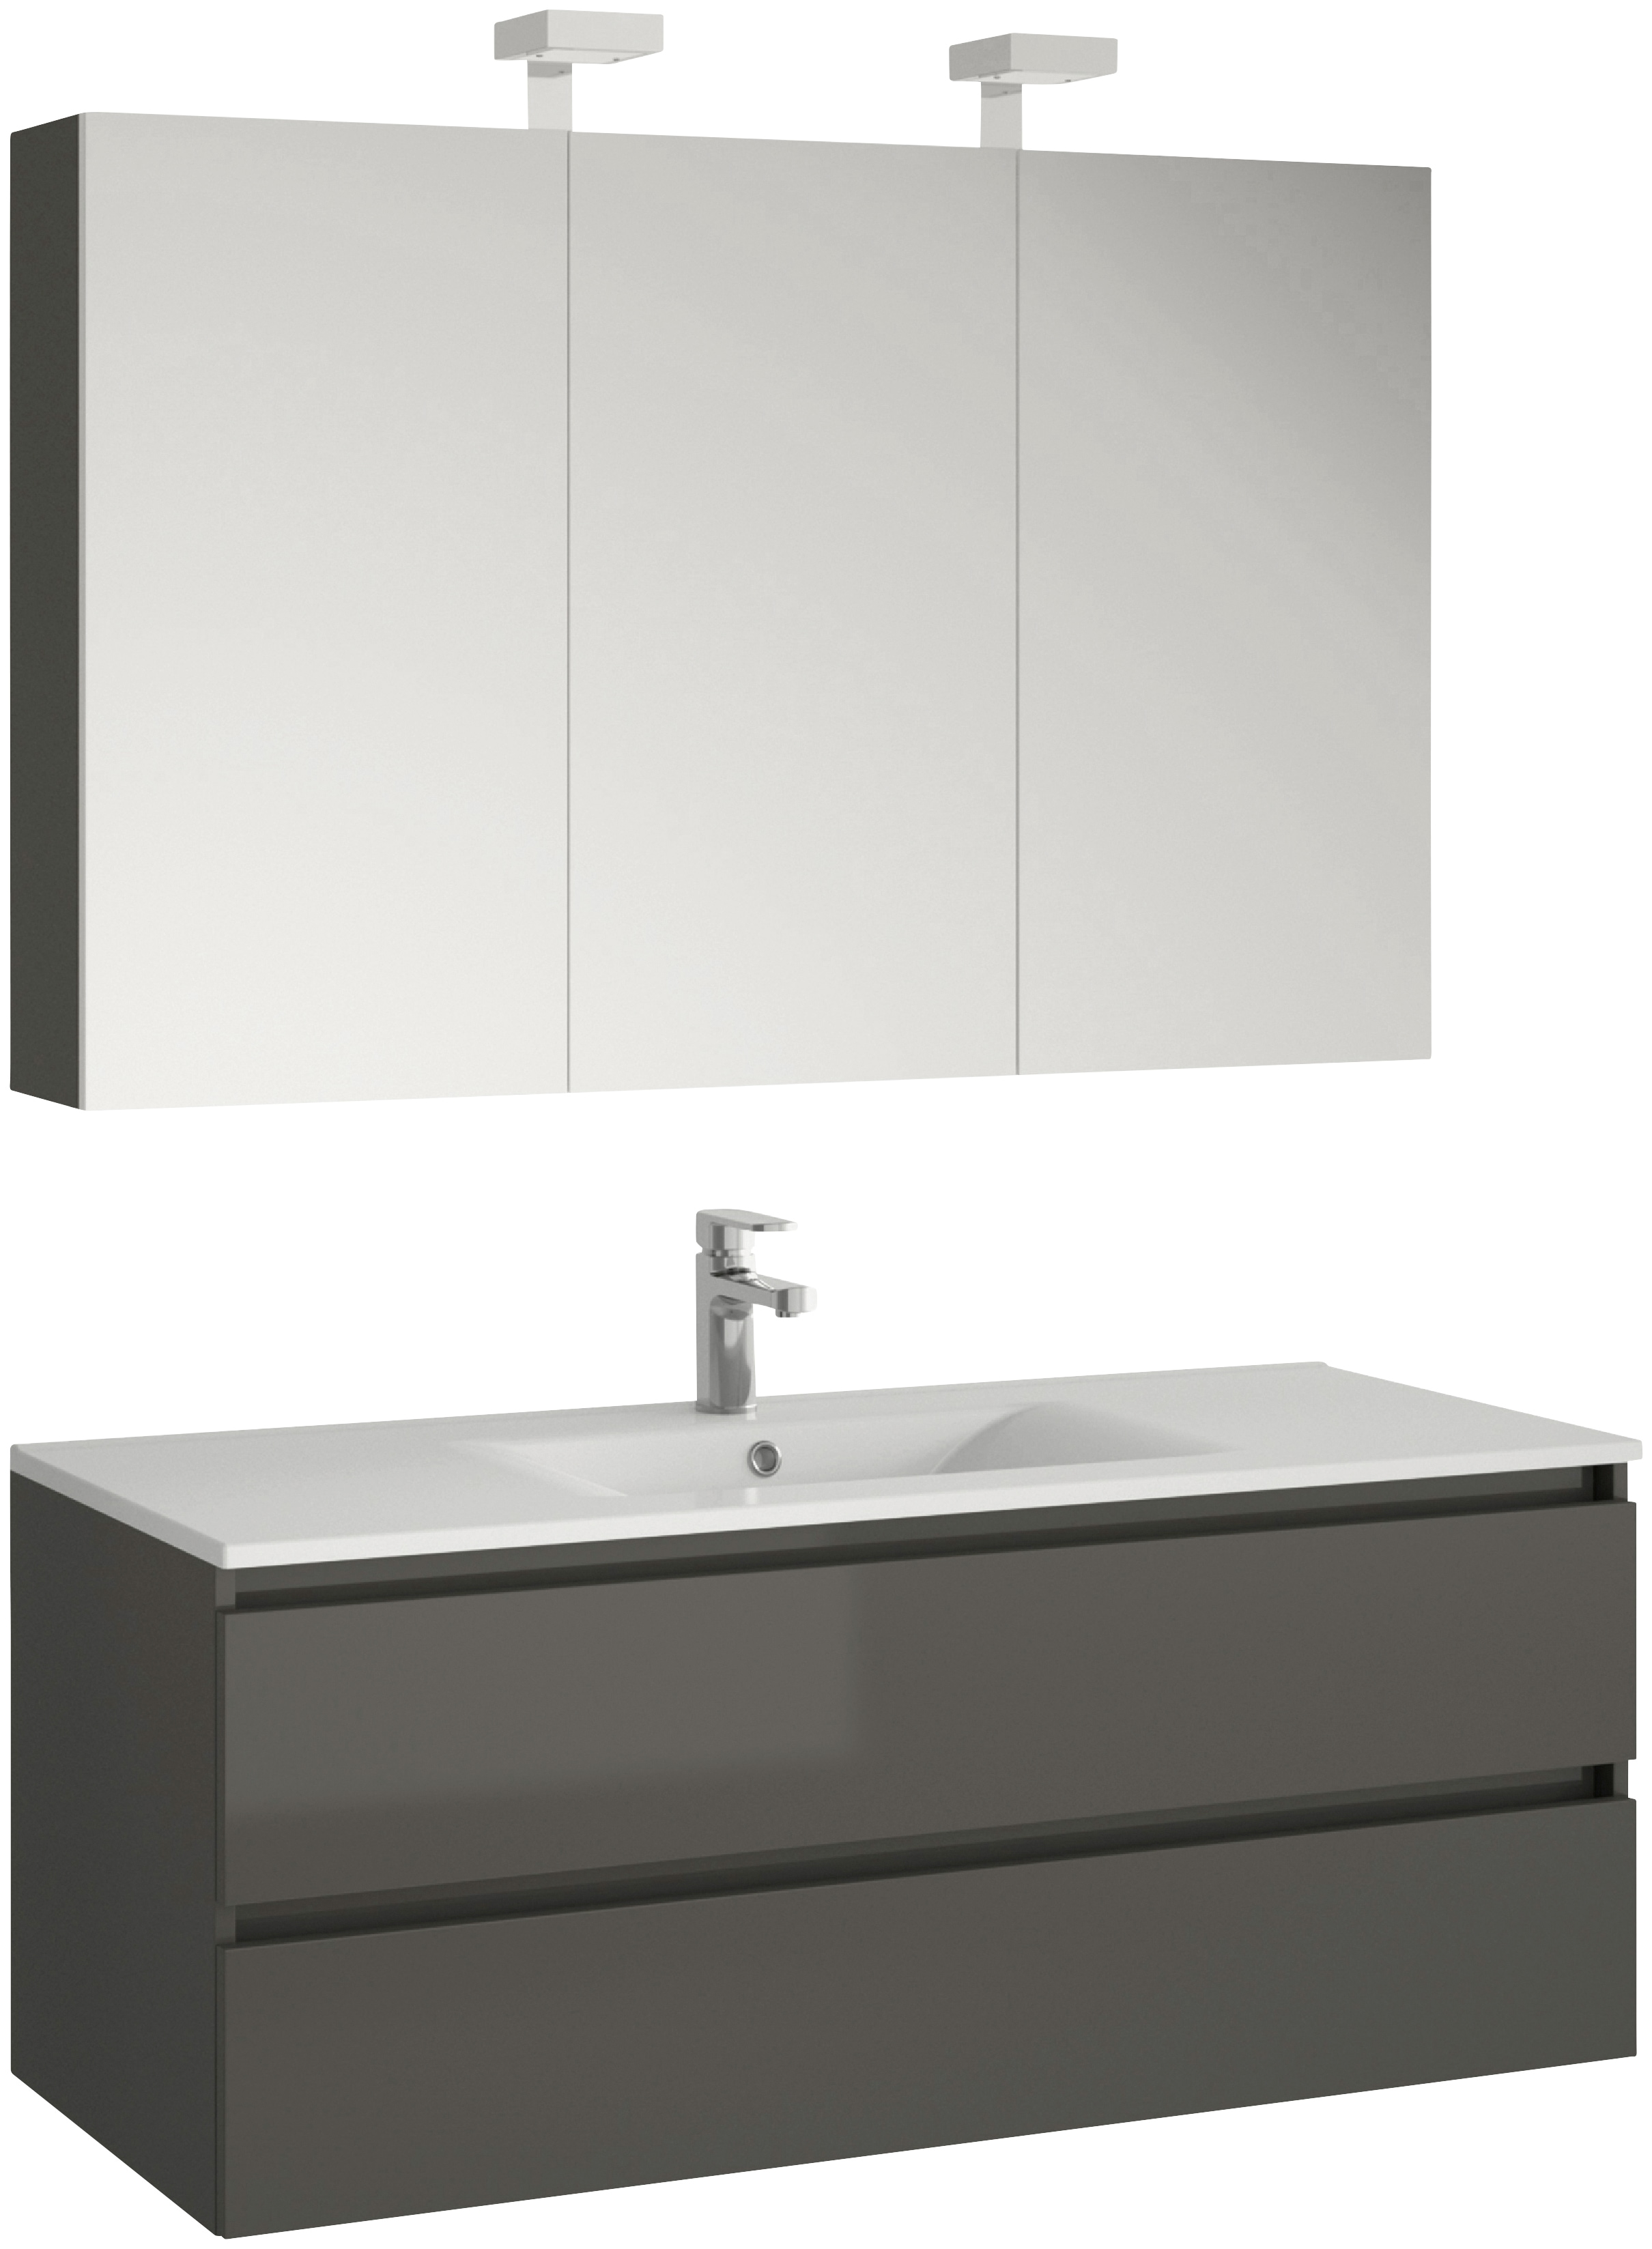 ALLIBERT Badmöbel-Set Alma Breite 120 cm (3-tlg)